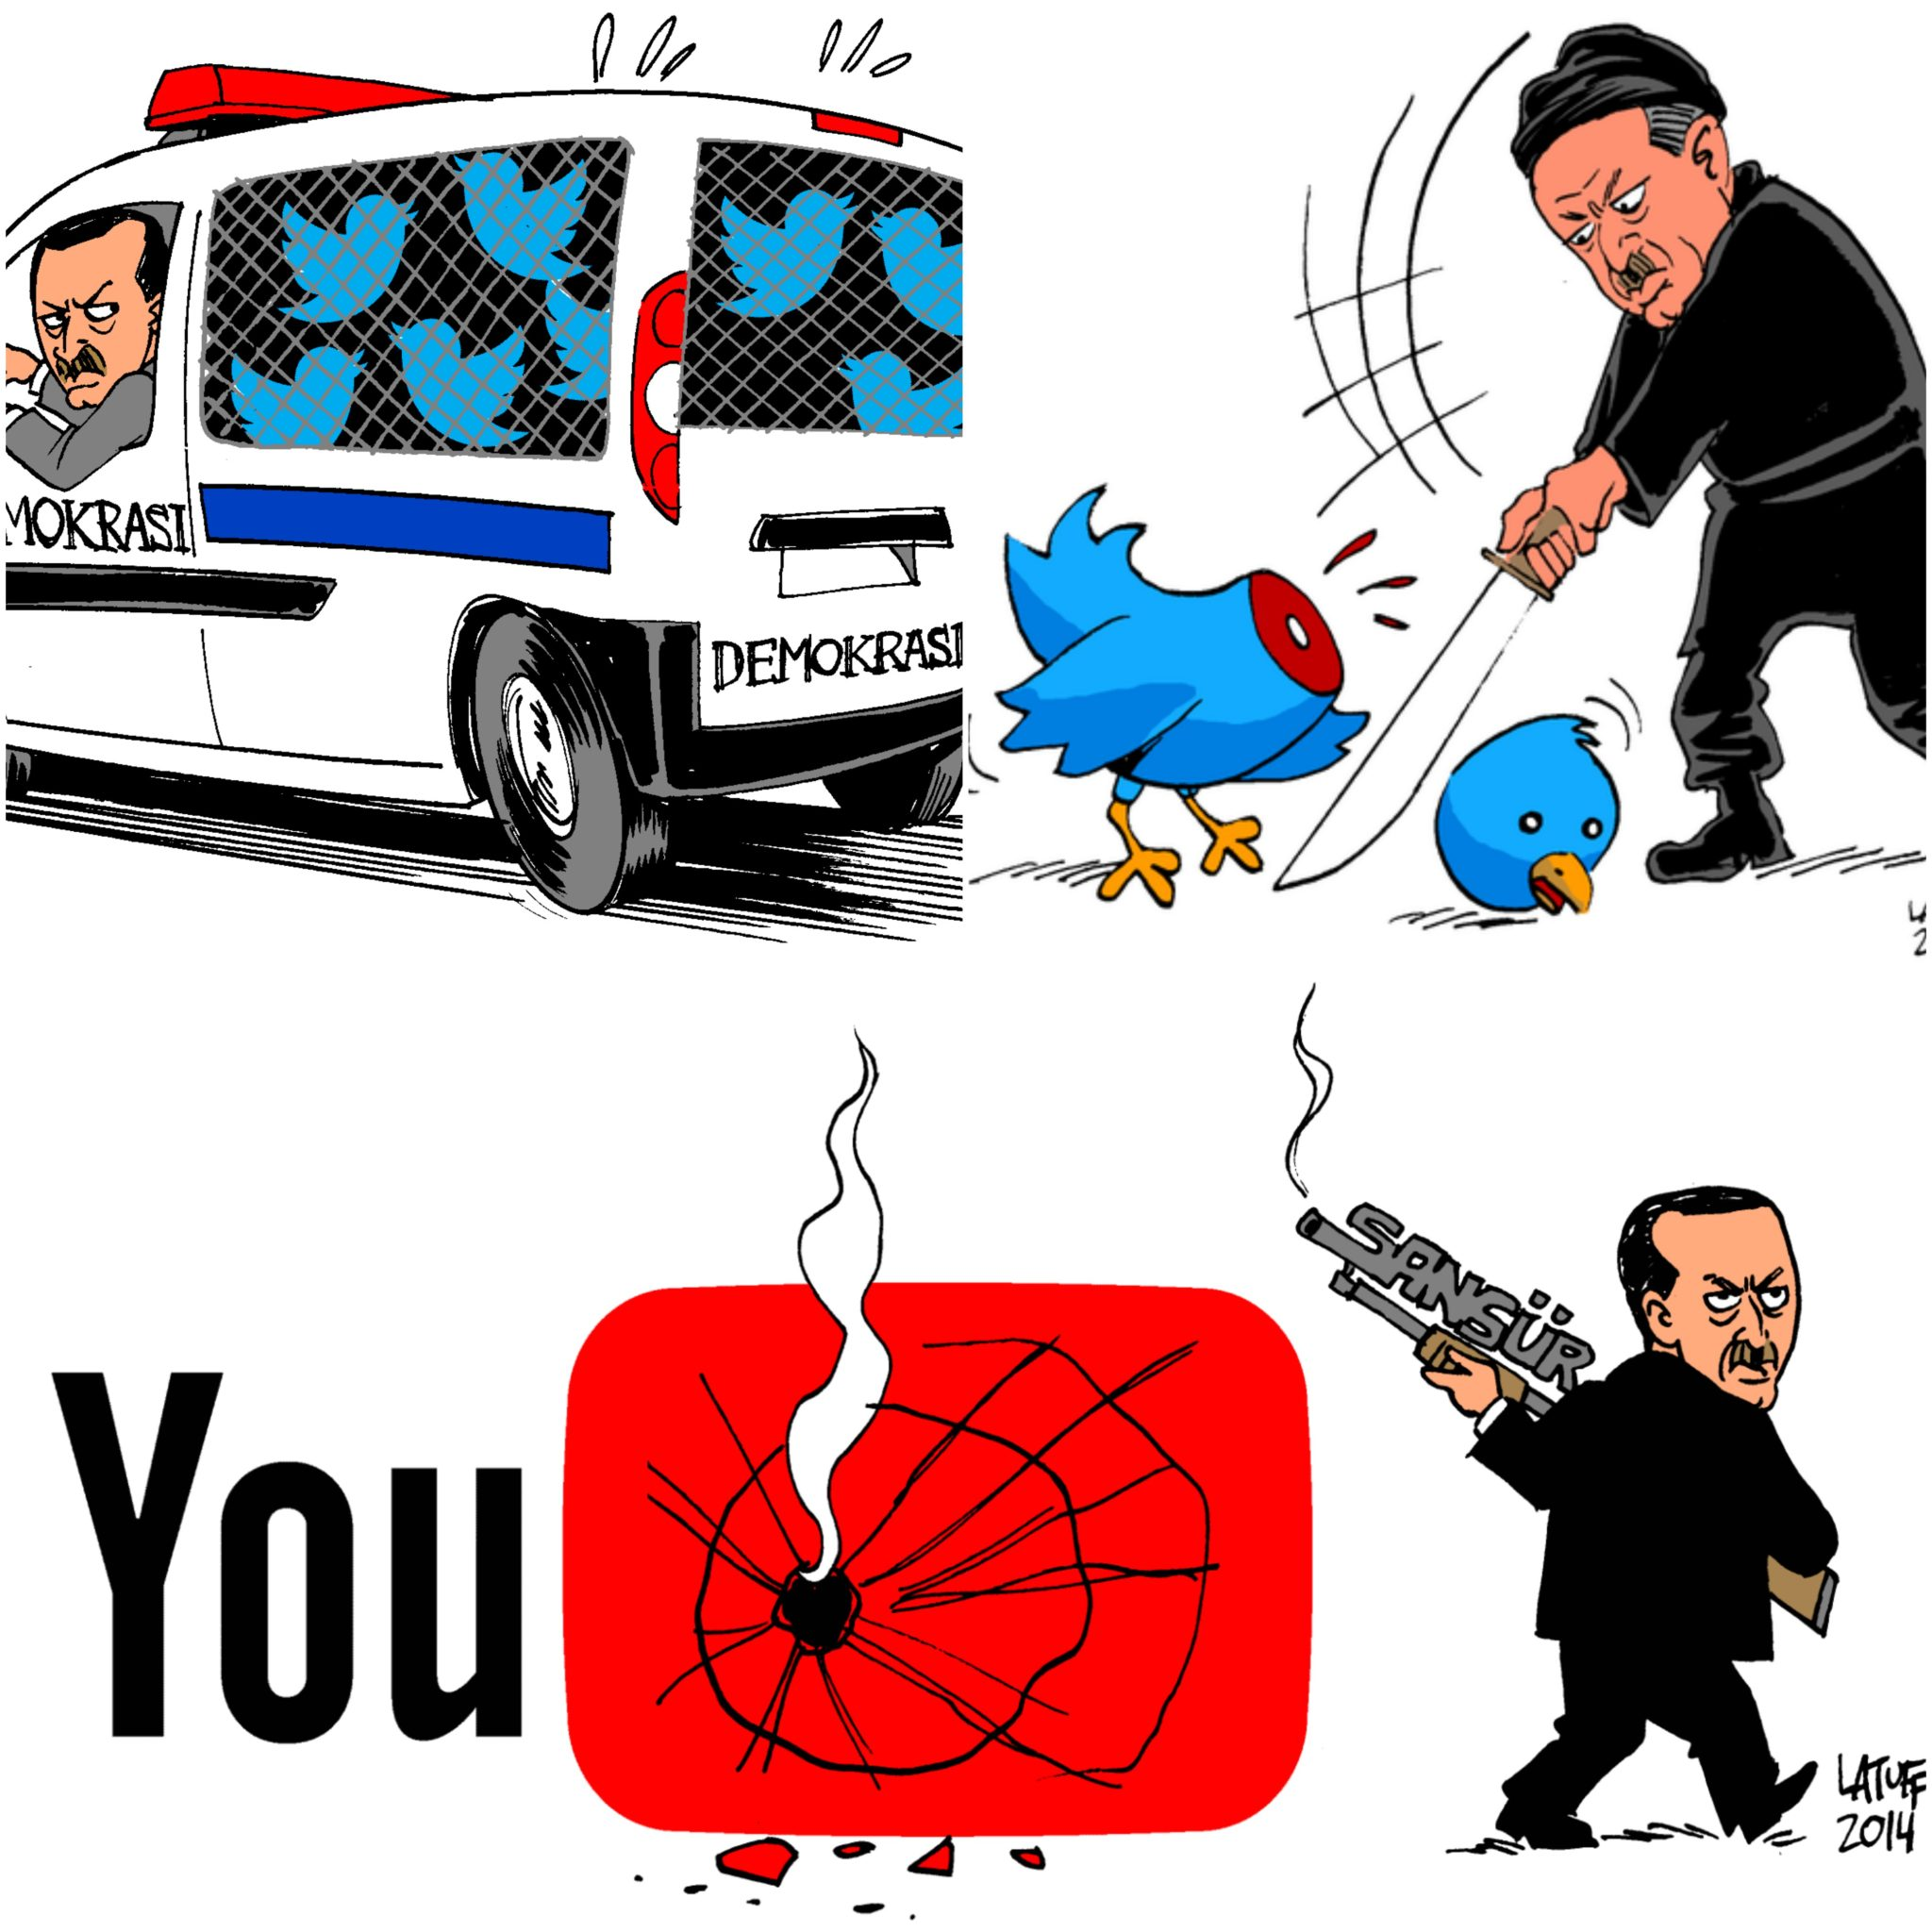 5dd3316433f Νέο «μπλακ άουτ» στις σελίδες κοινωνικής δικτύωσης στην Τουρκία ...